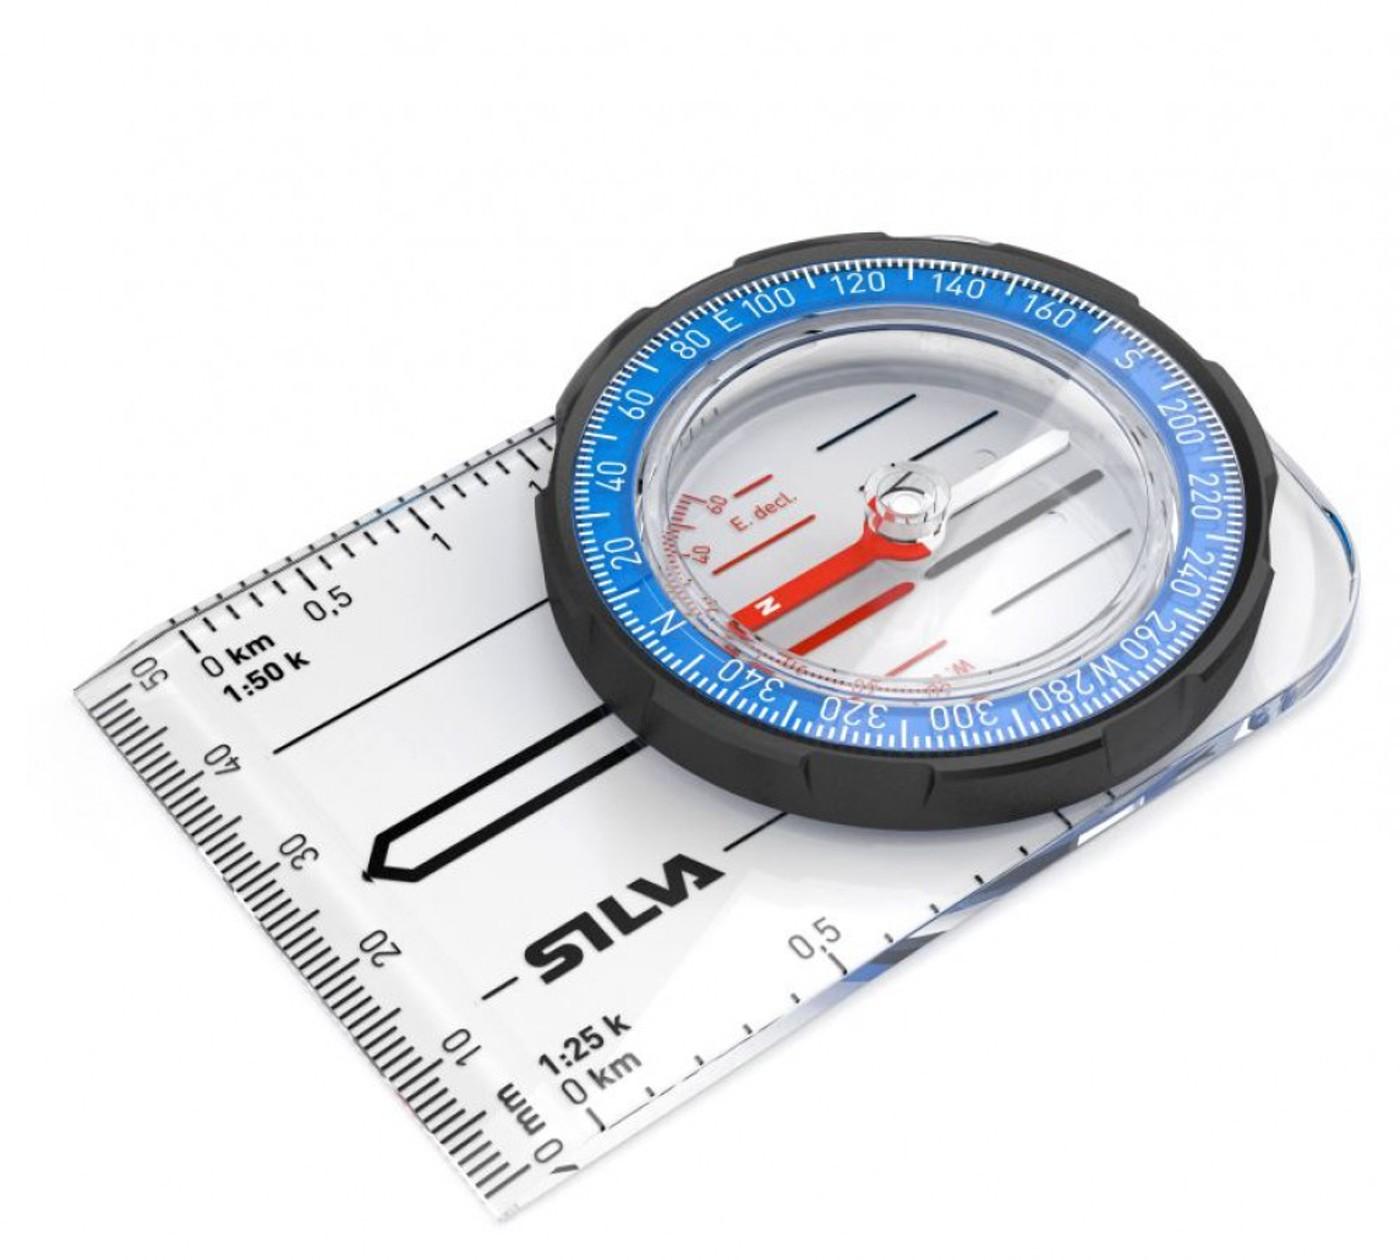 SILVA Compass Field